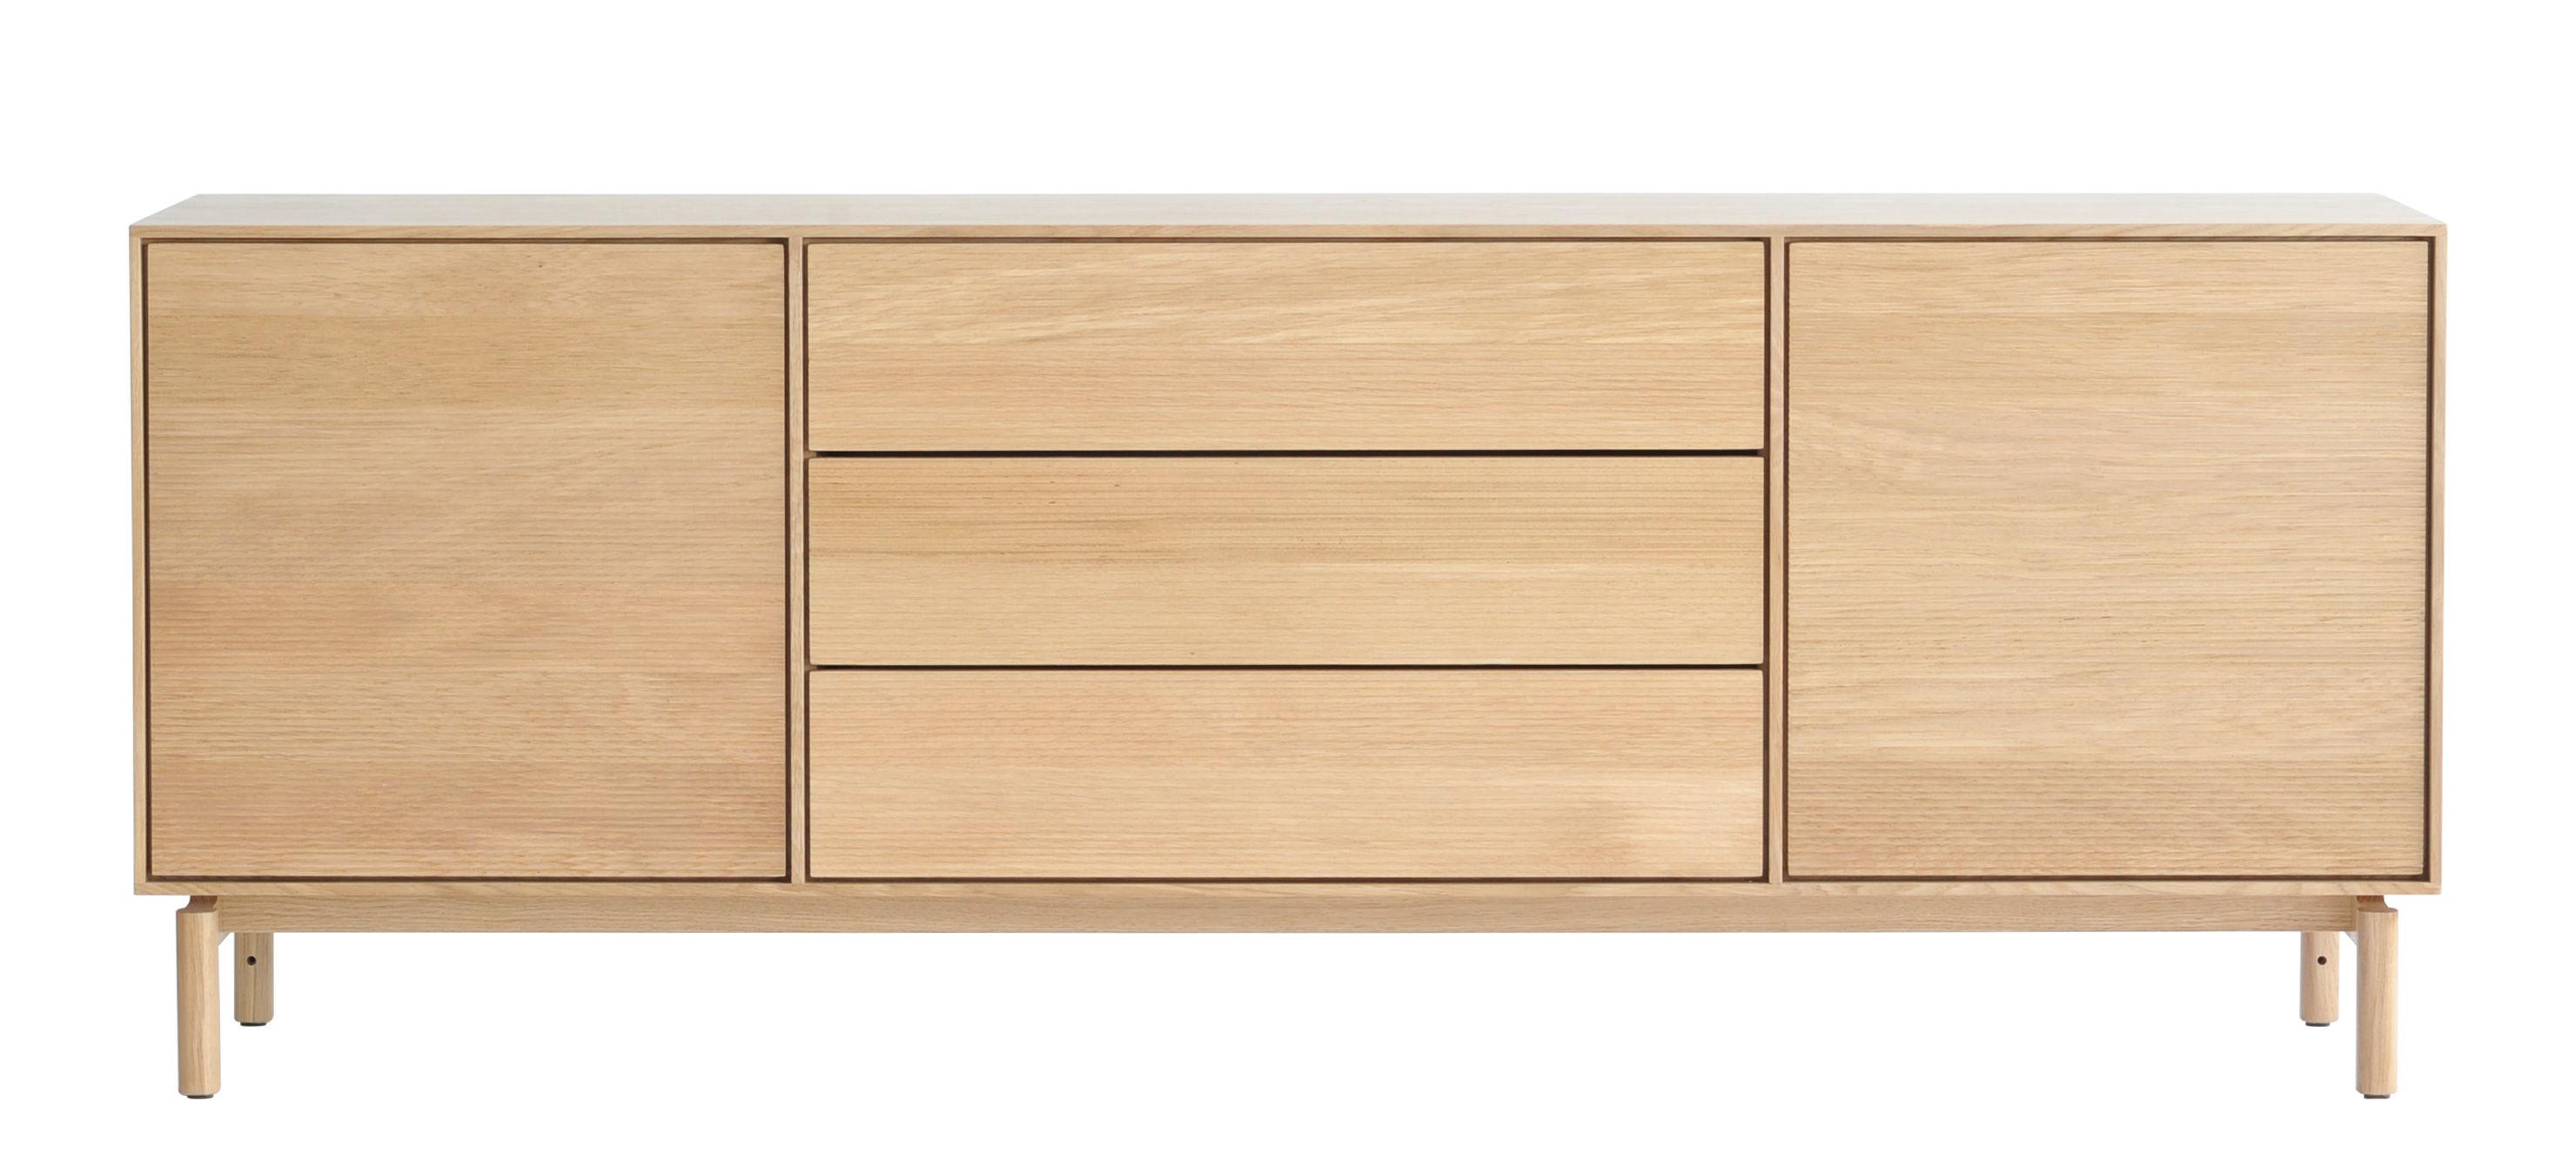 Mobilier - Commodes, buffets & armoires - Buffet Modulo Large / L 182 cm - 2 portes + 3 tiroirs - Ercol - Chêne - Chêne massif